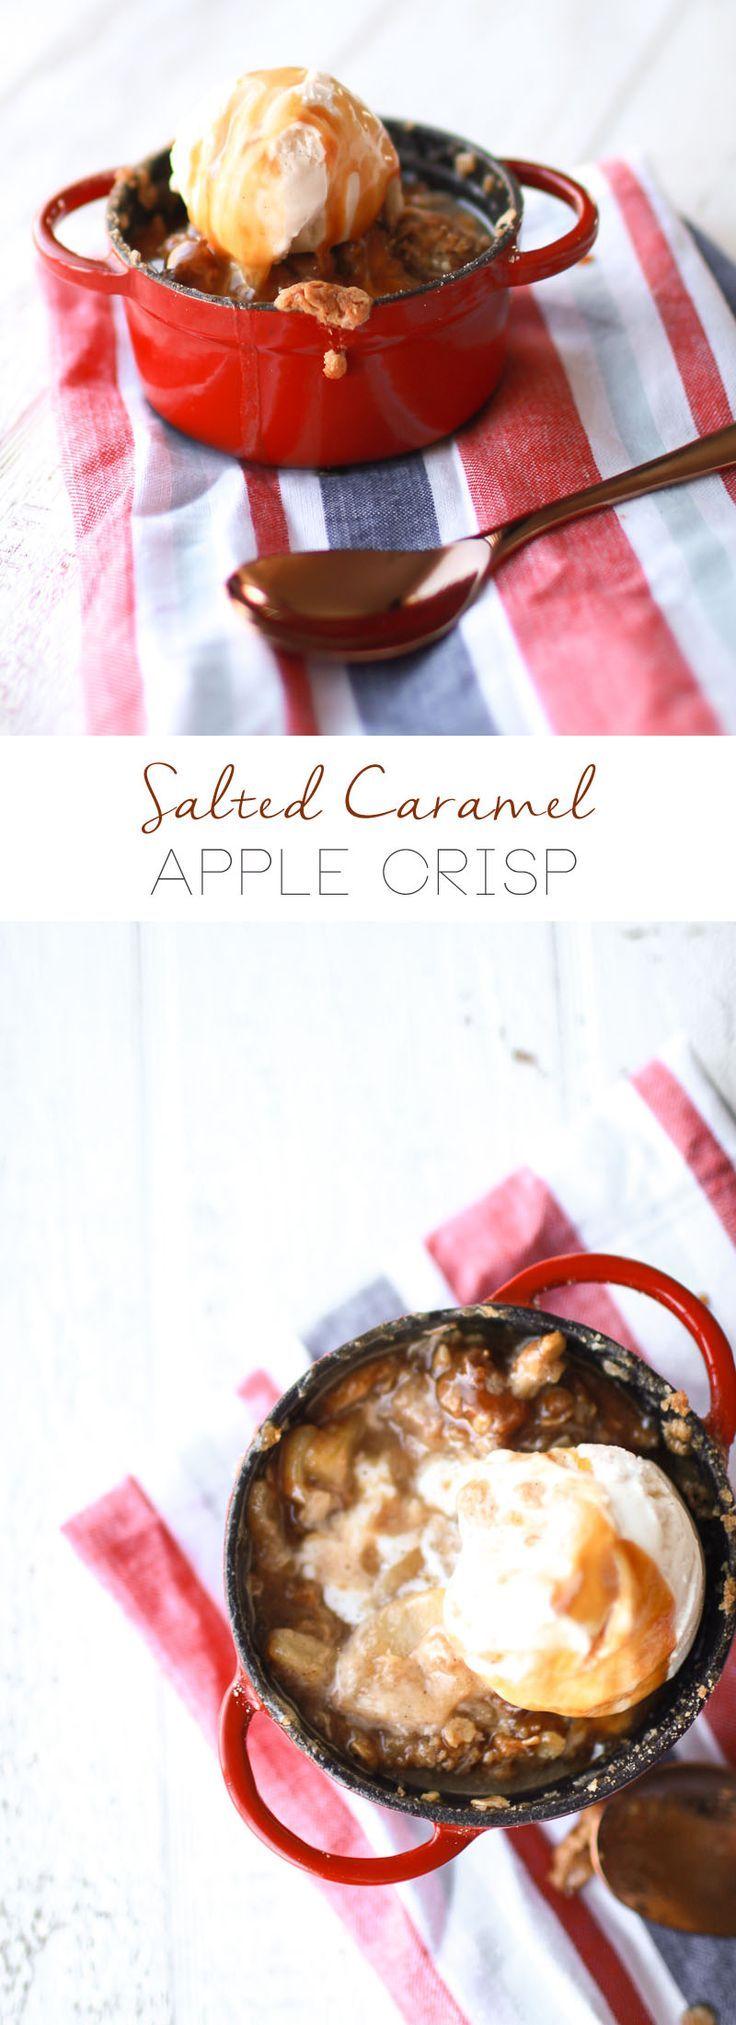 Salted Caramel Apple Crisp | homemade apple crisp recipe | dessert recipes using apples | apple dessert recipes | how to make homemade apple crisp | dessert recipe ideas | ideas for summer desserts || Oh So Delicioso